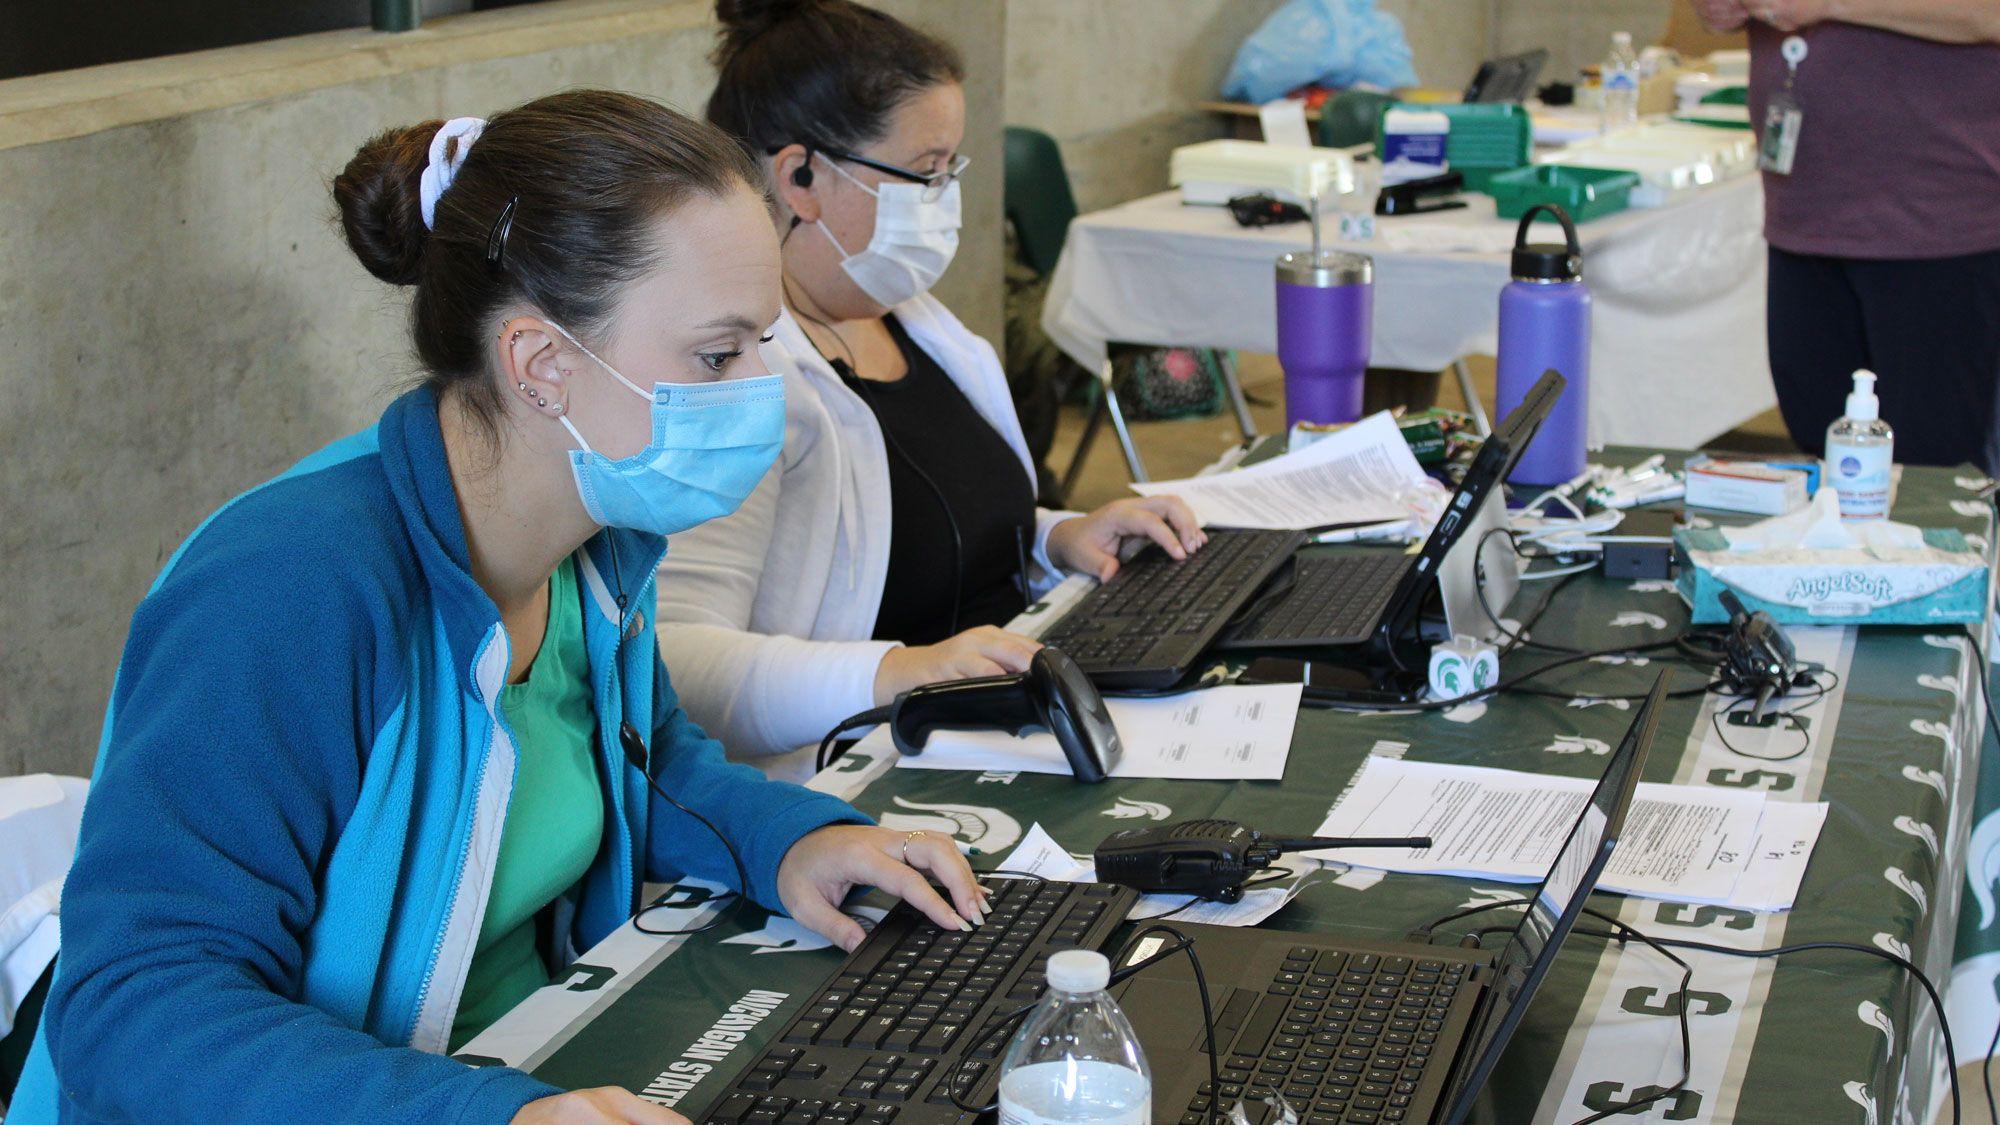 VanEpps-Passage-flu-shot-clinic-2020-IMG_0522.jpg